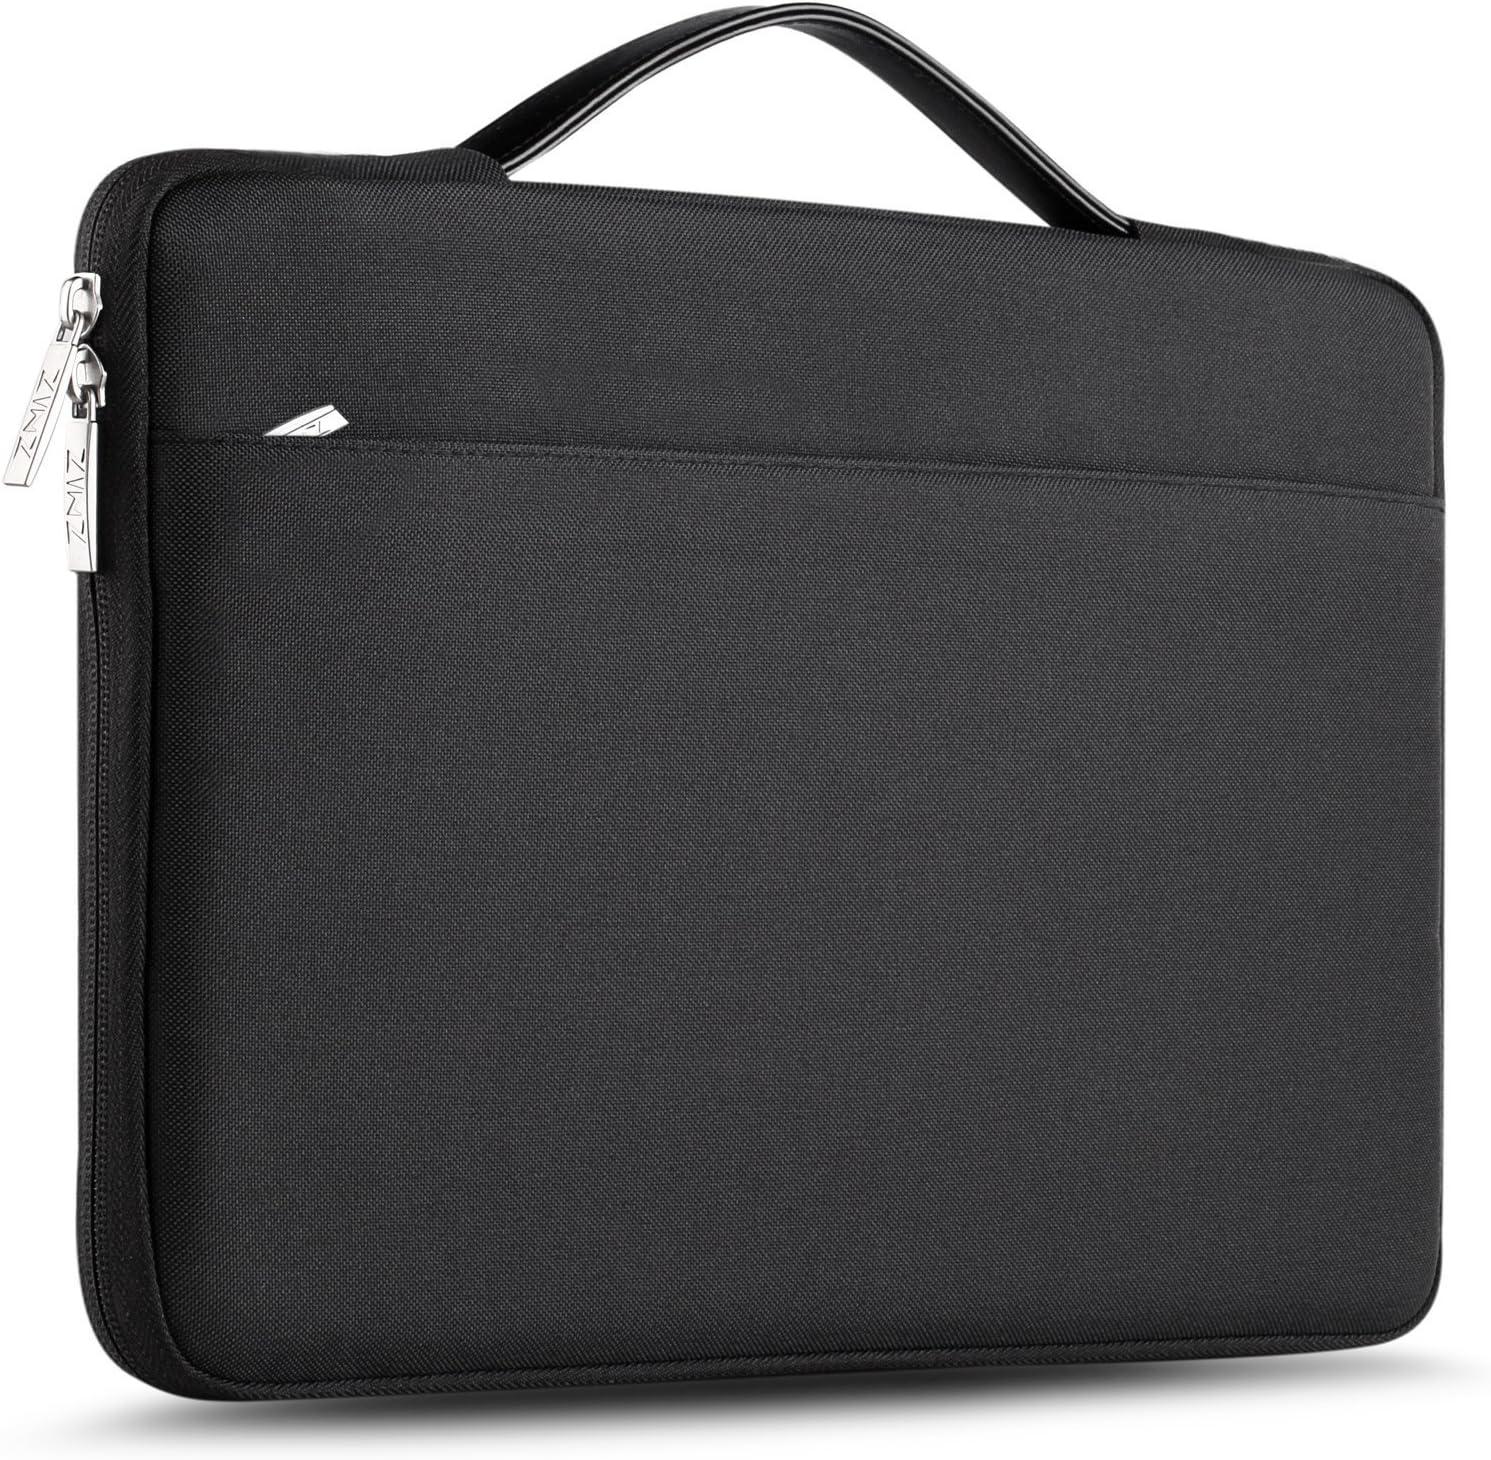 ZINZ Maletín 15 15,6 16 Funda Portátil Impermeable para 15-16 Pulgadas MacBook Pro 16 15, Surface Laptop 3 15,XPS 15 Laptop Ultrabook Netbook, DELL HP Lenovo Acer ASUS y más, Negro